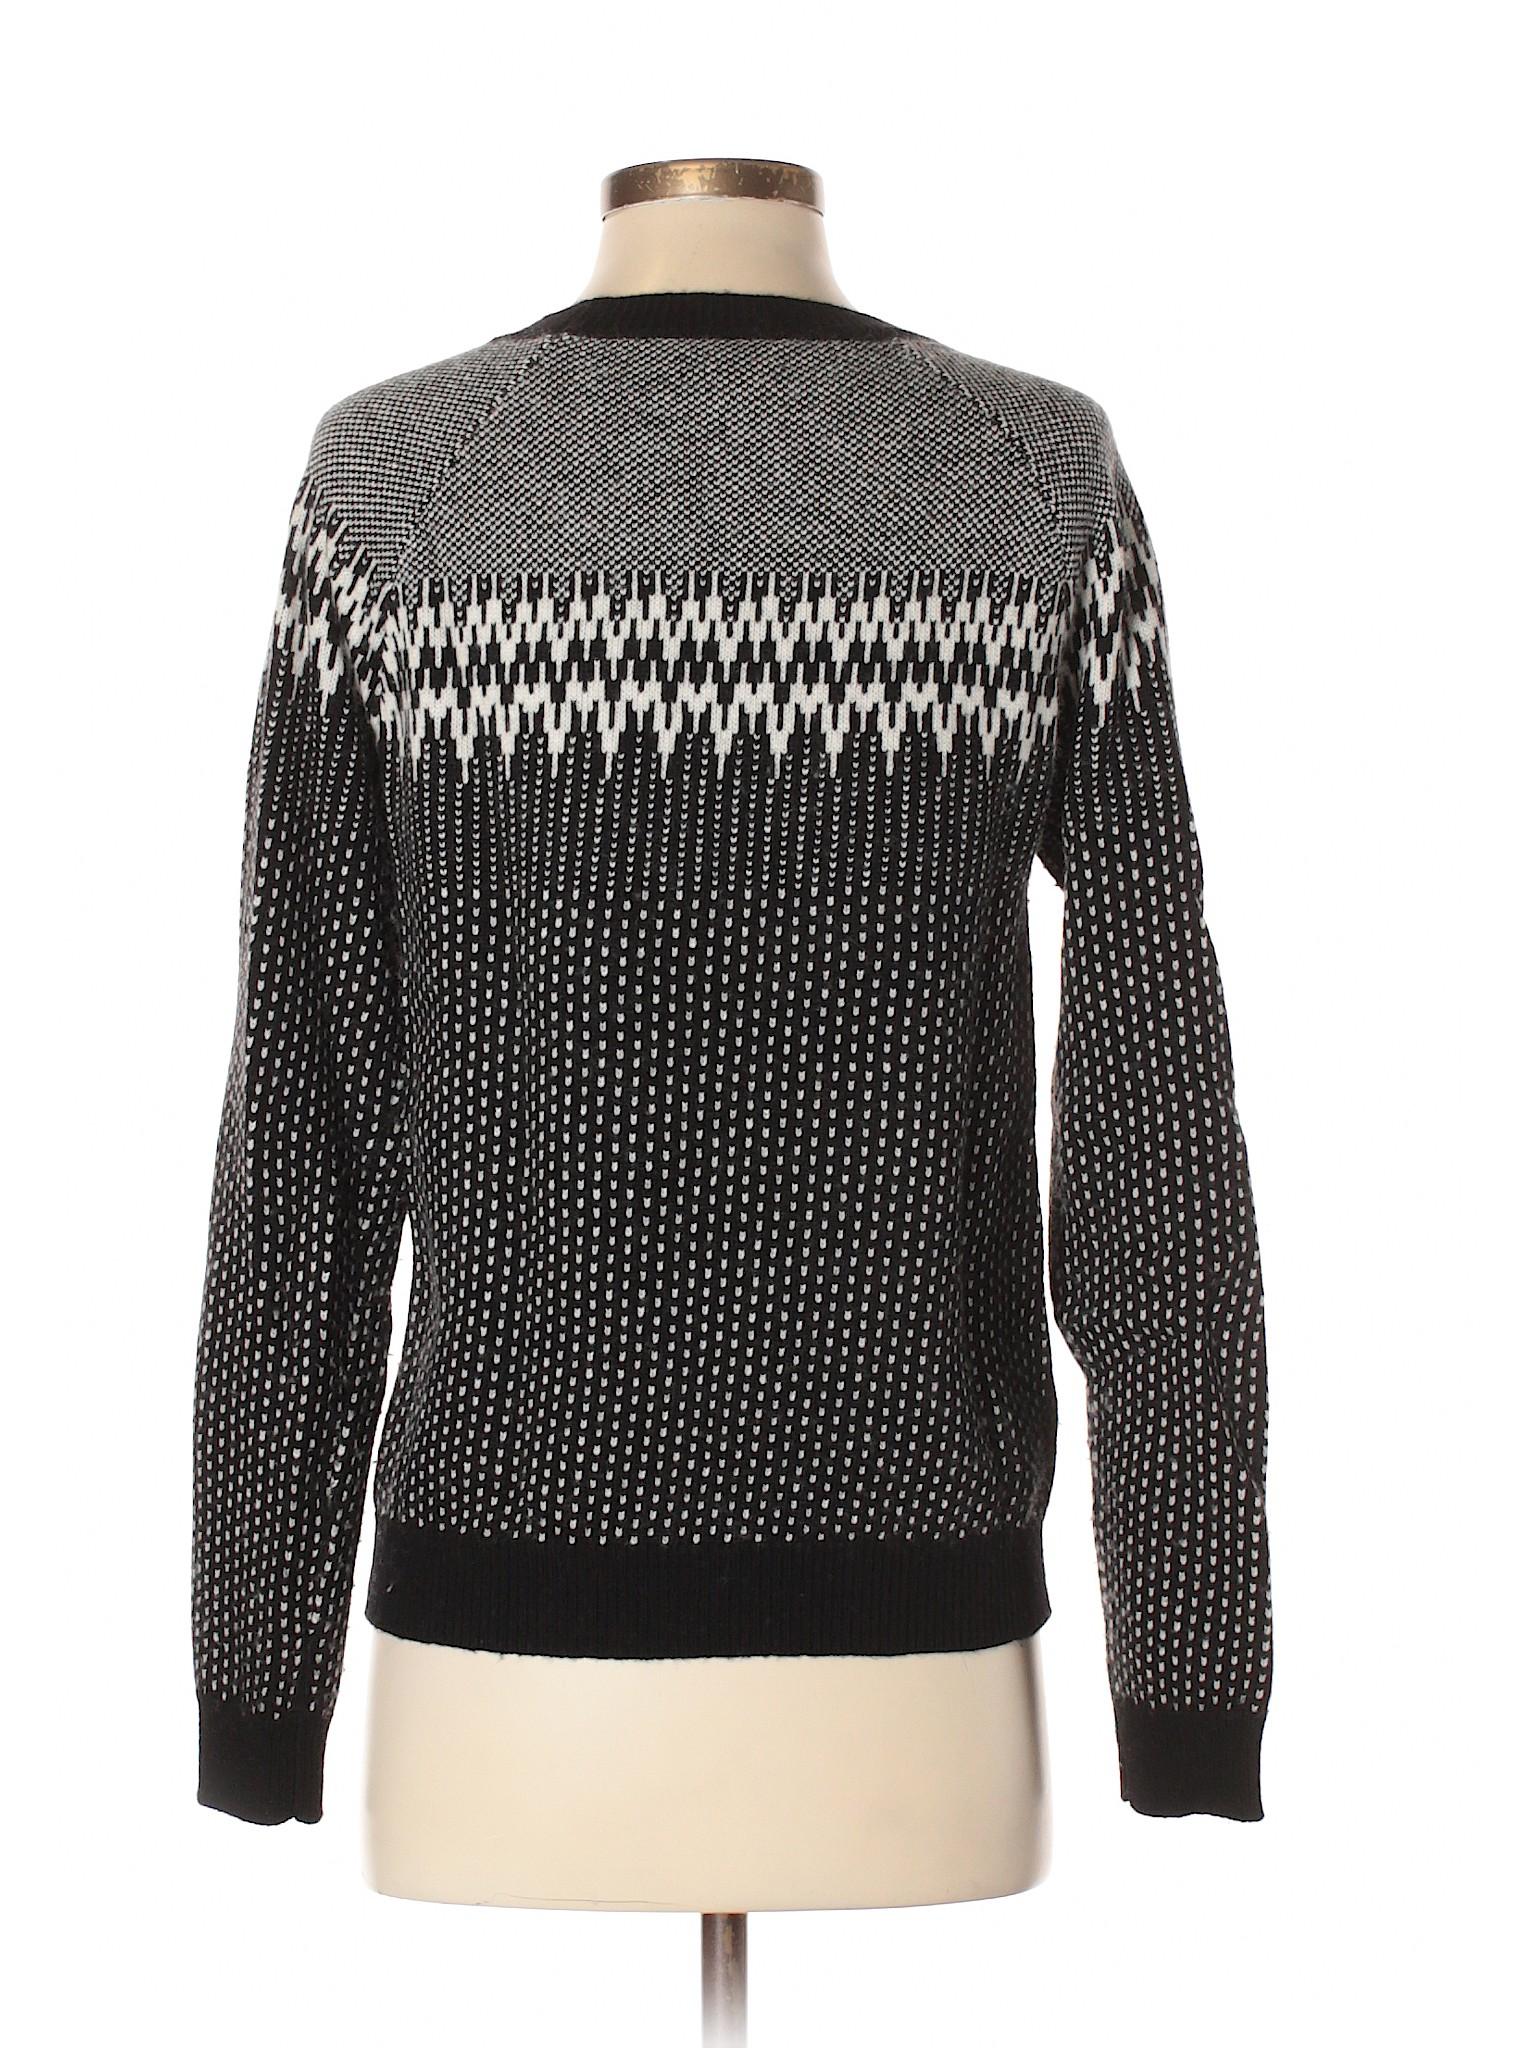 J Boutique Crew Boutique Sweater J Pullover xEgF4Fw